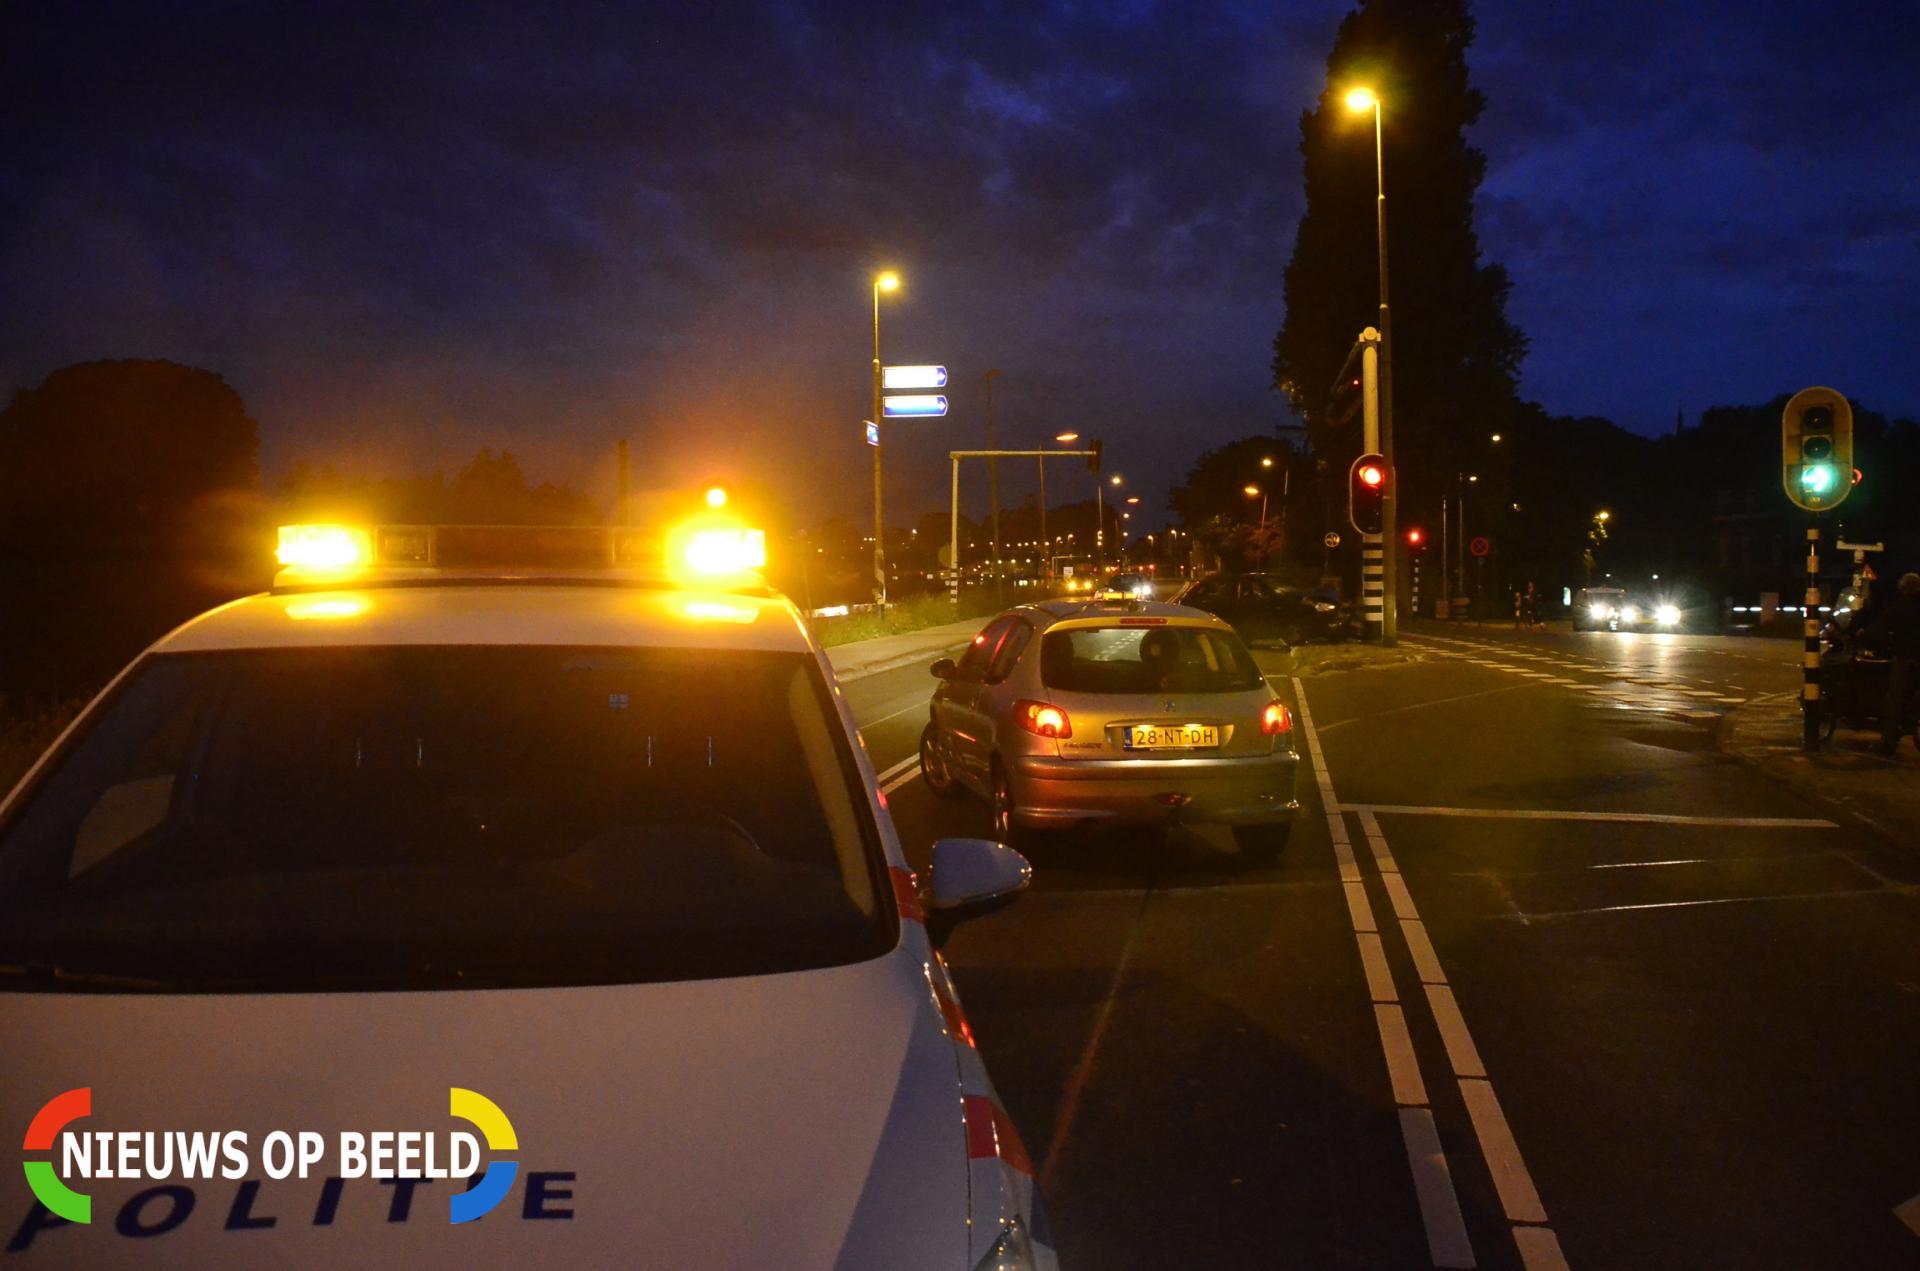 Auto total loss na botsing tegen verkeerslicht Goejanverwelledijk Gouda